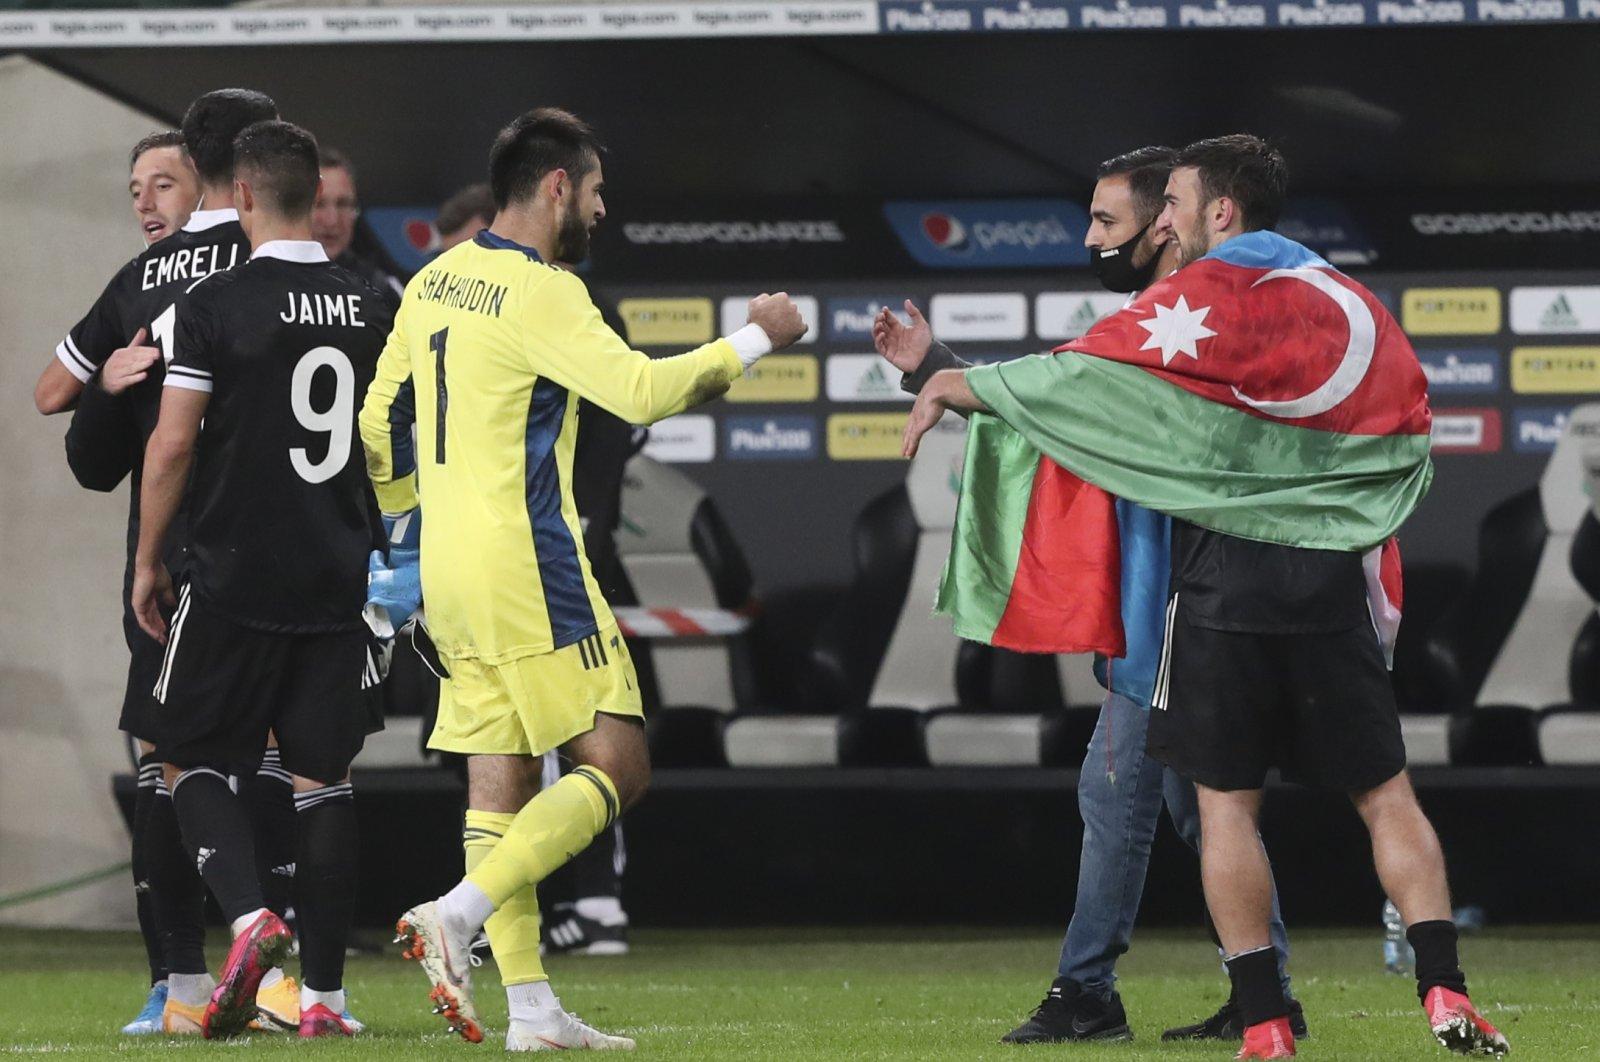 Qarabag's Qara Qarayev, with an Azerbaijani flag, and his team celebrates after the Europa League football match between Legia Warsaw and Qarabag, in Warsaw, Poland, Oct. 1, 2020. (AP Photo)